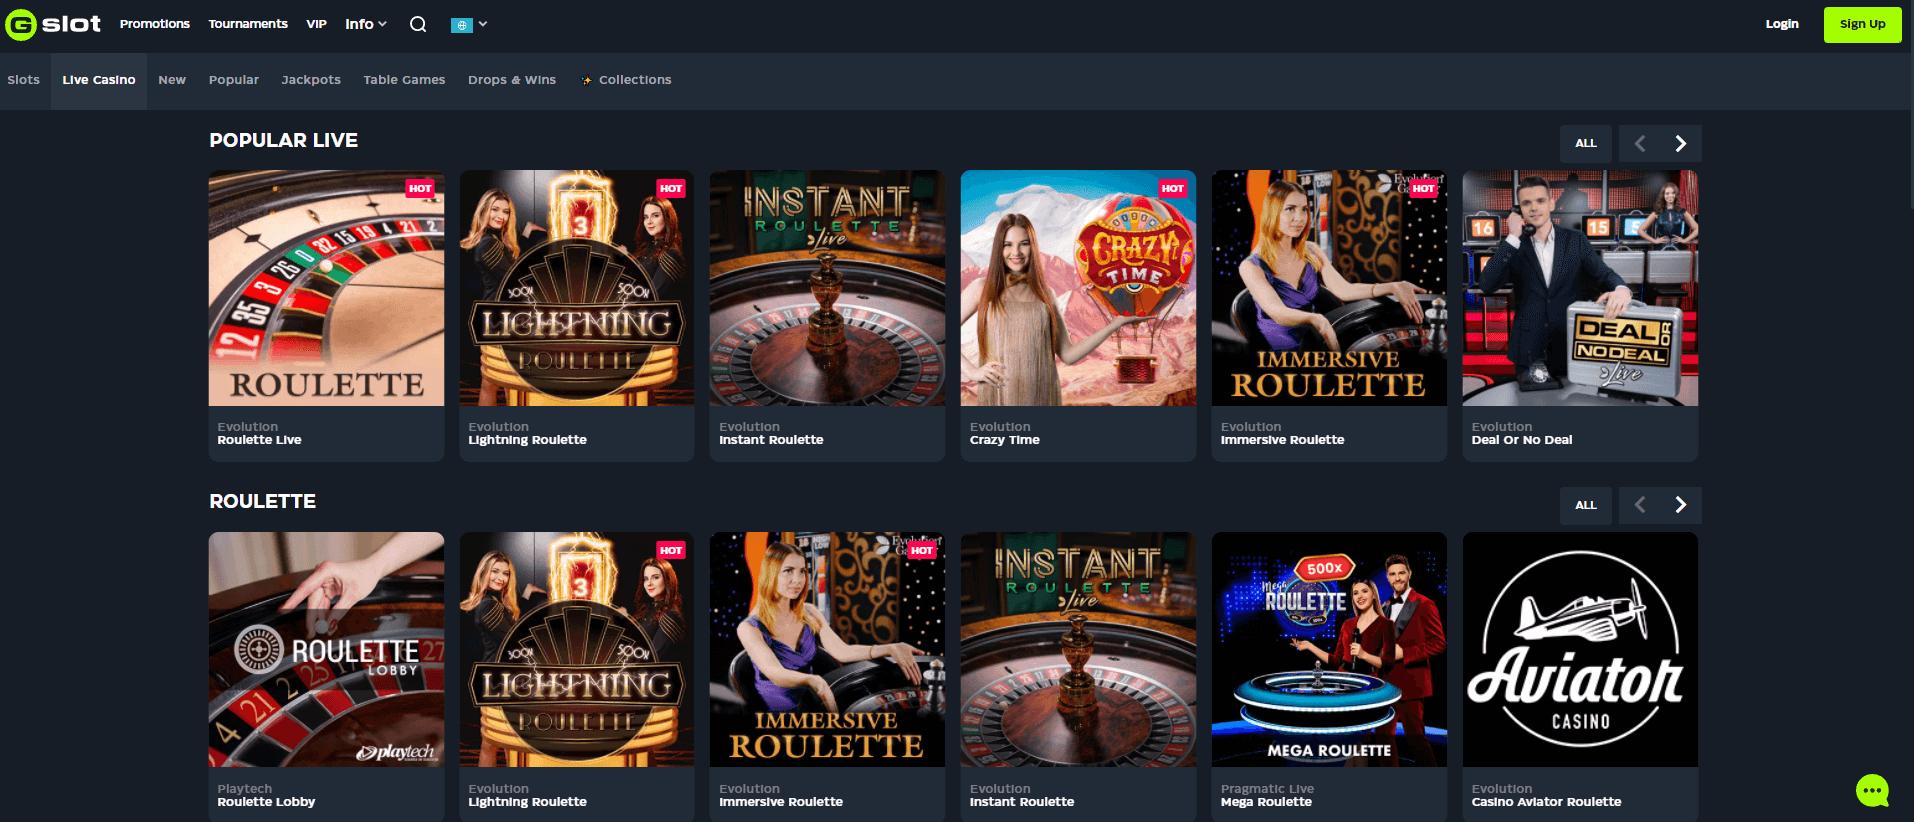 GSlot Live casino lobby